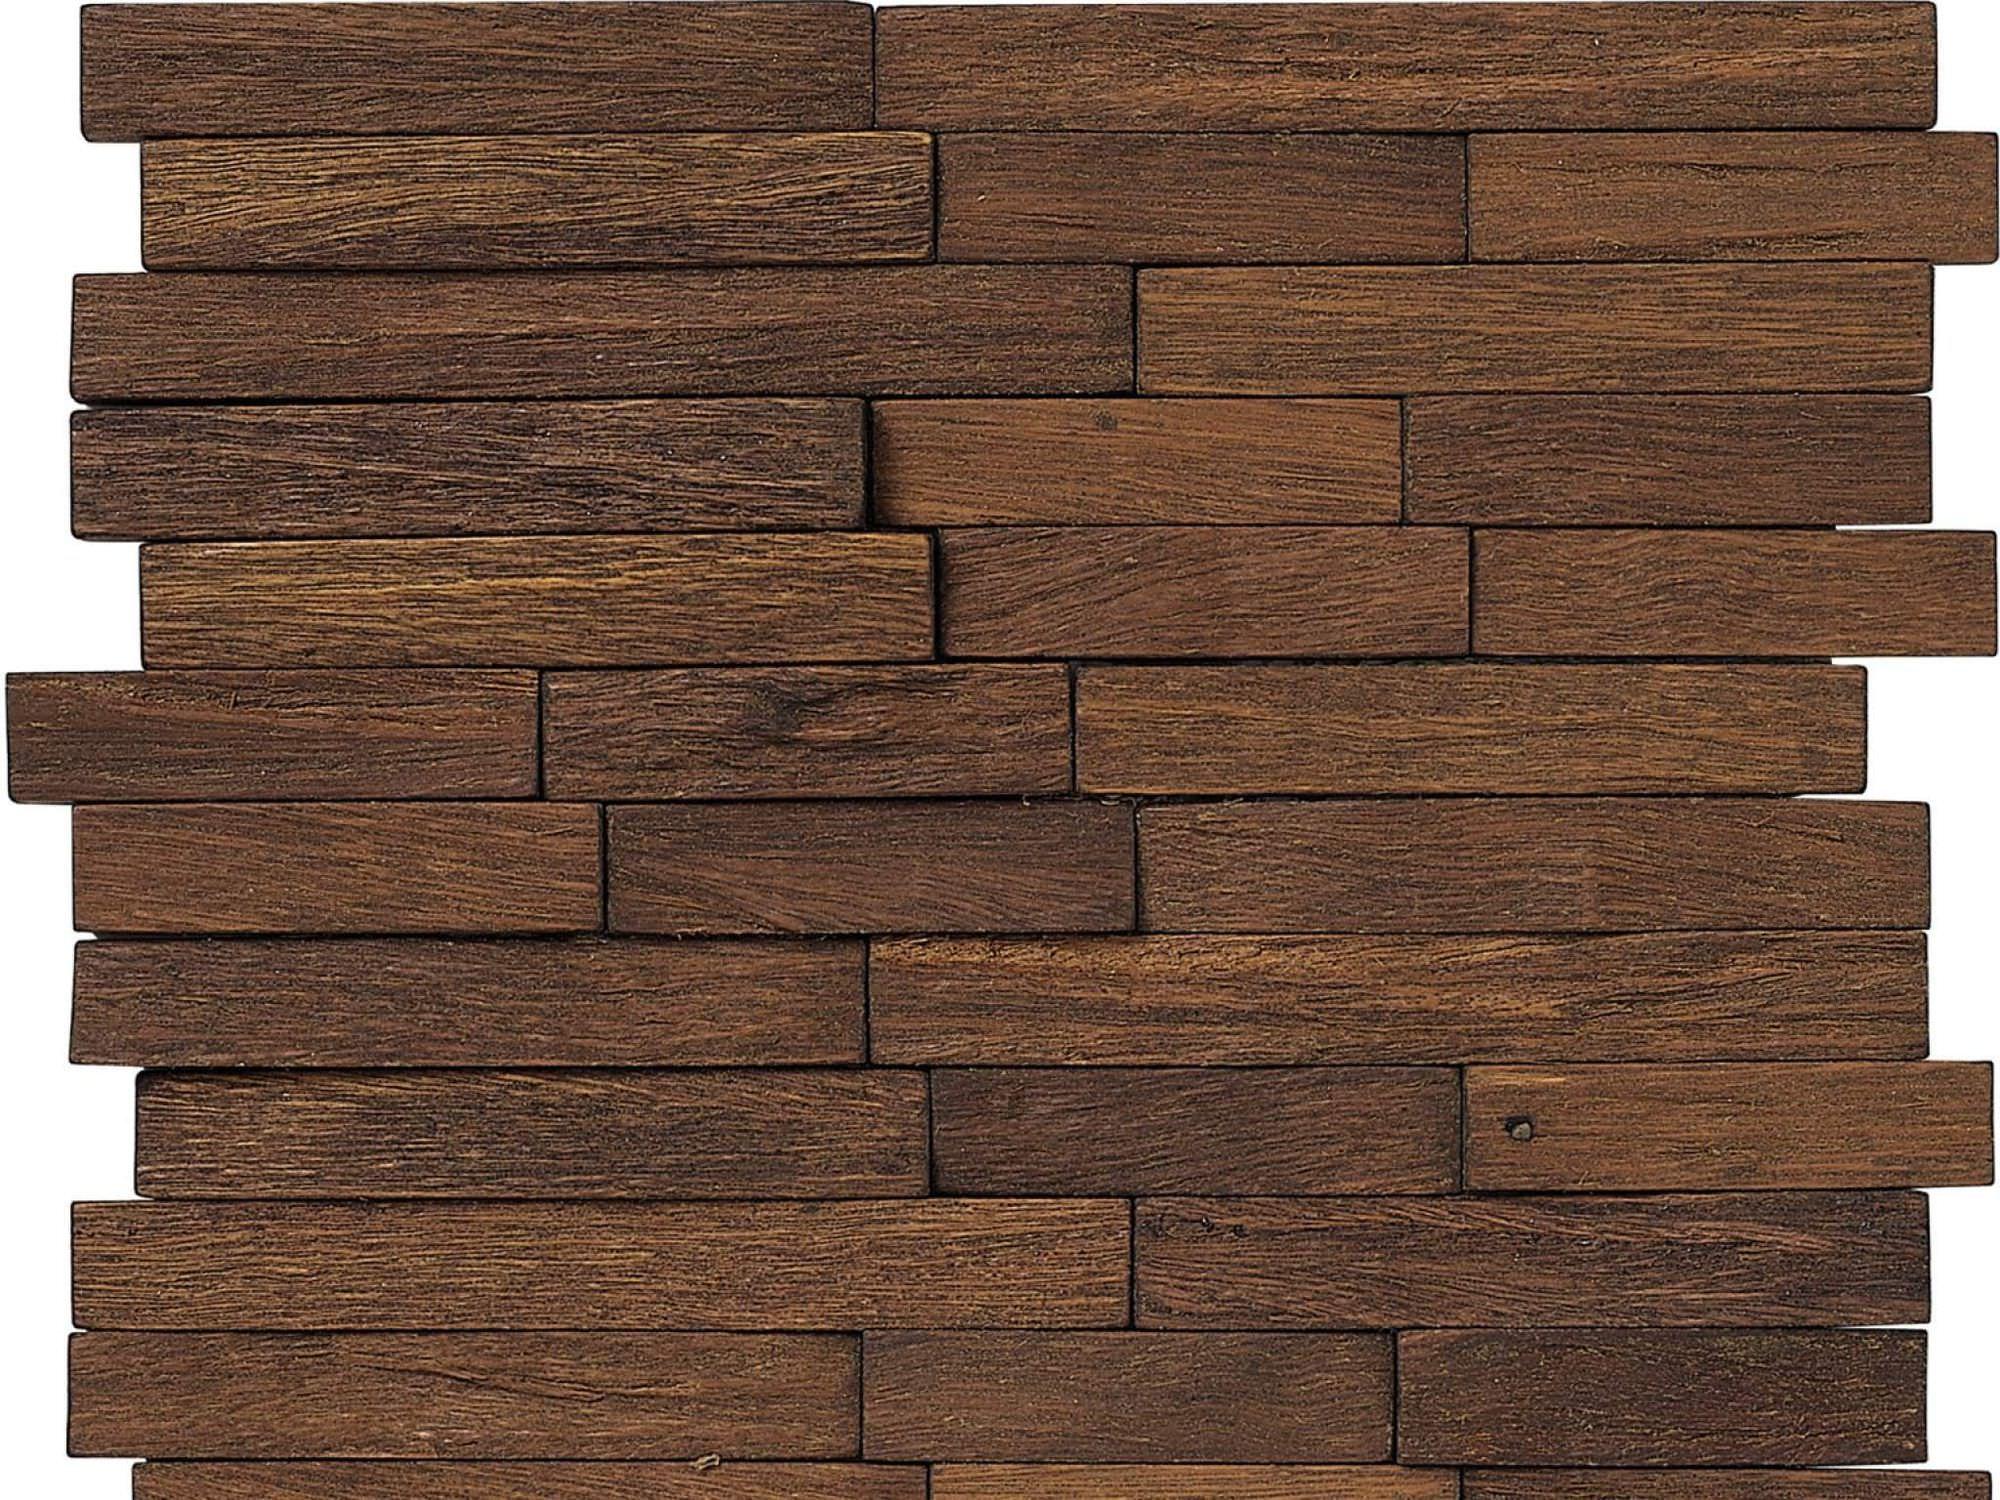 Decorative Wood Wall Tiles Pamesa Ceramica 2015  Google Search  Wood  Pinterest